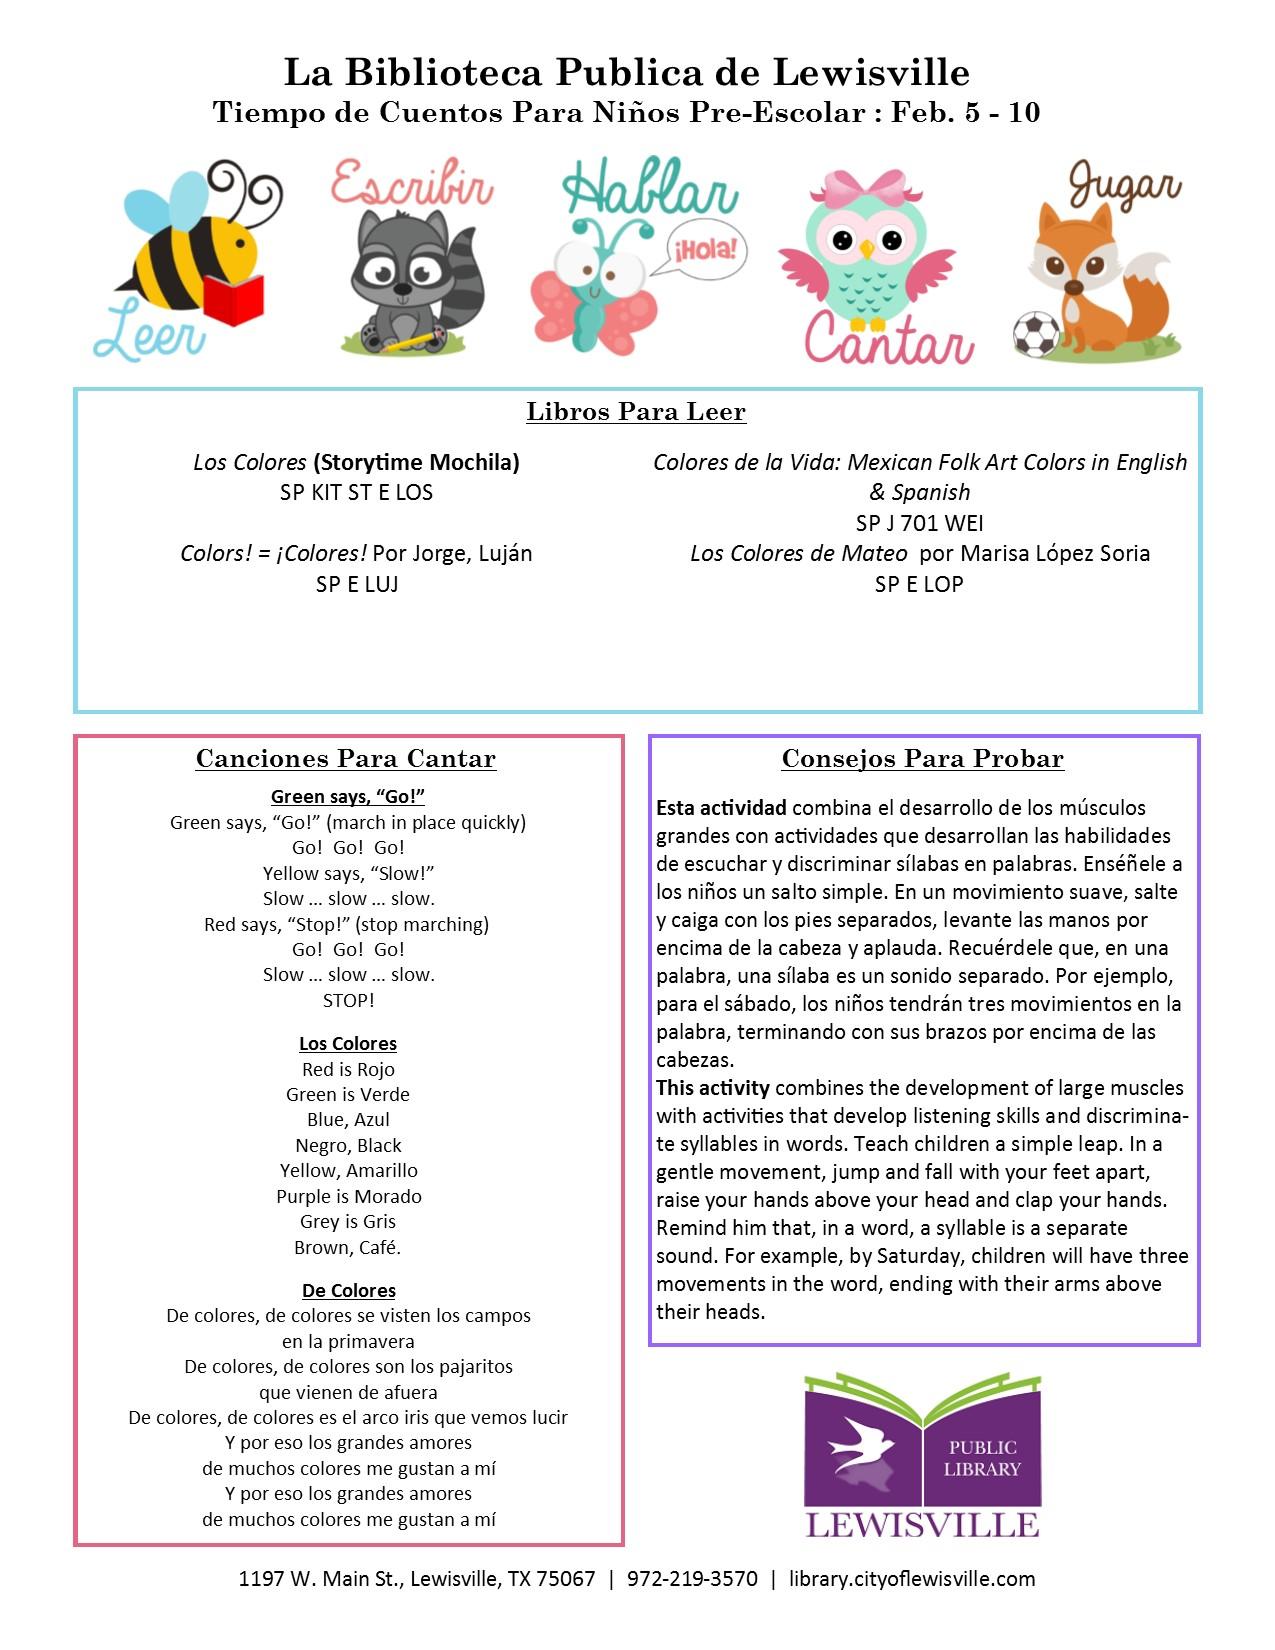 Spanish Preschool Time Lewisville Public Library